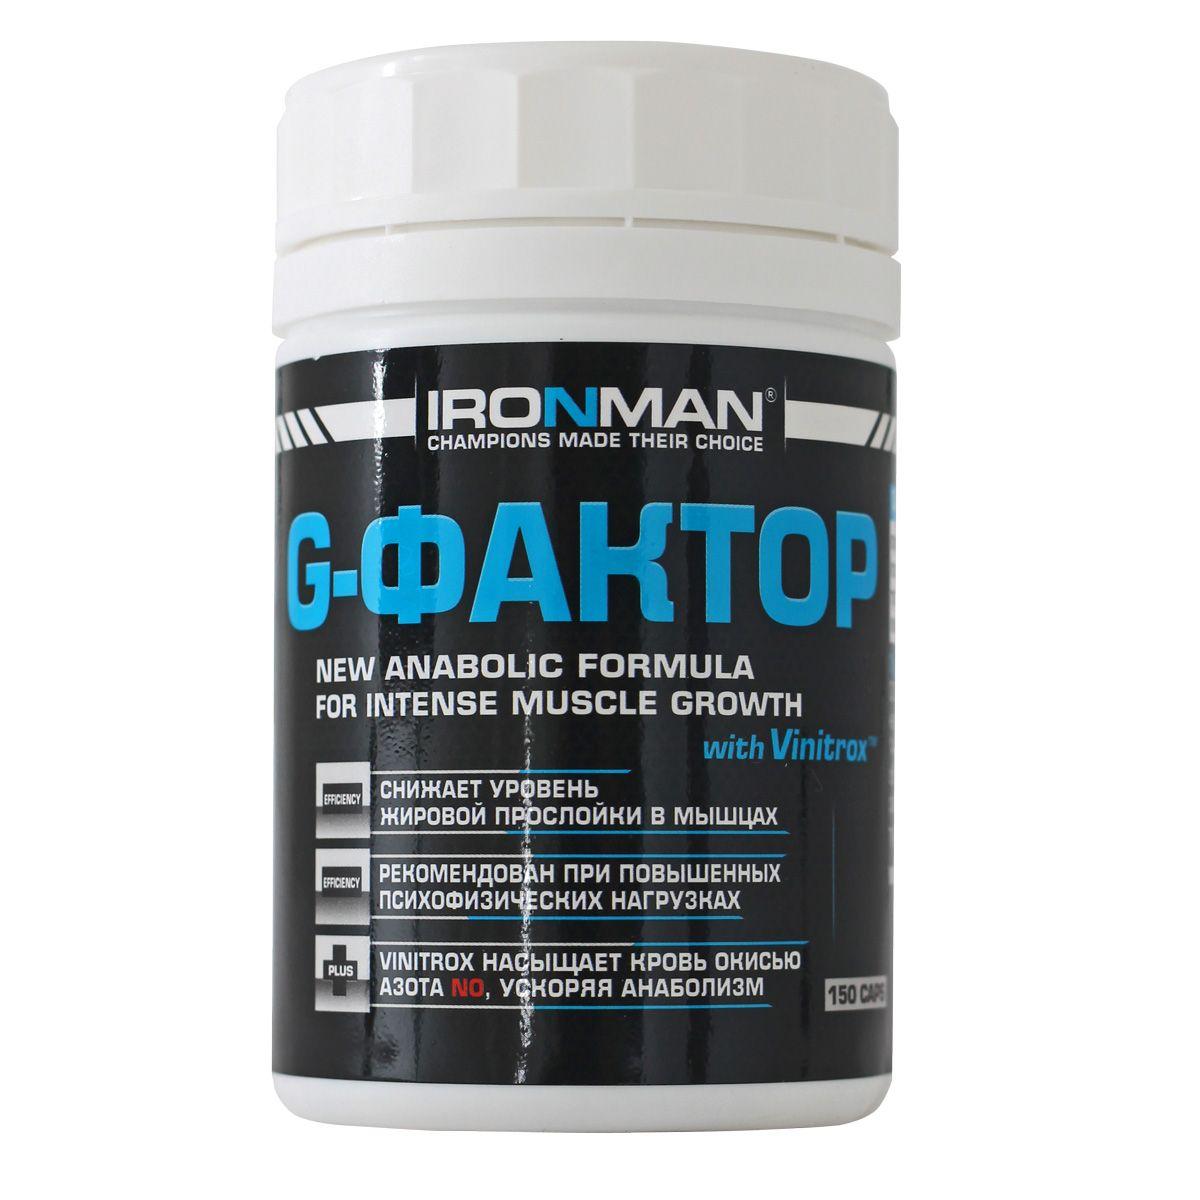 Ironman Джи-фактор, 150 капсул